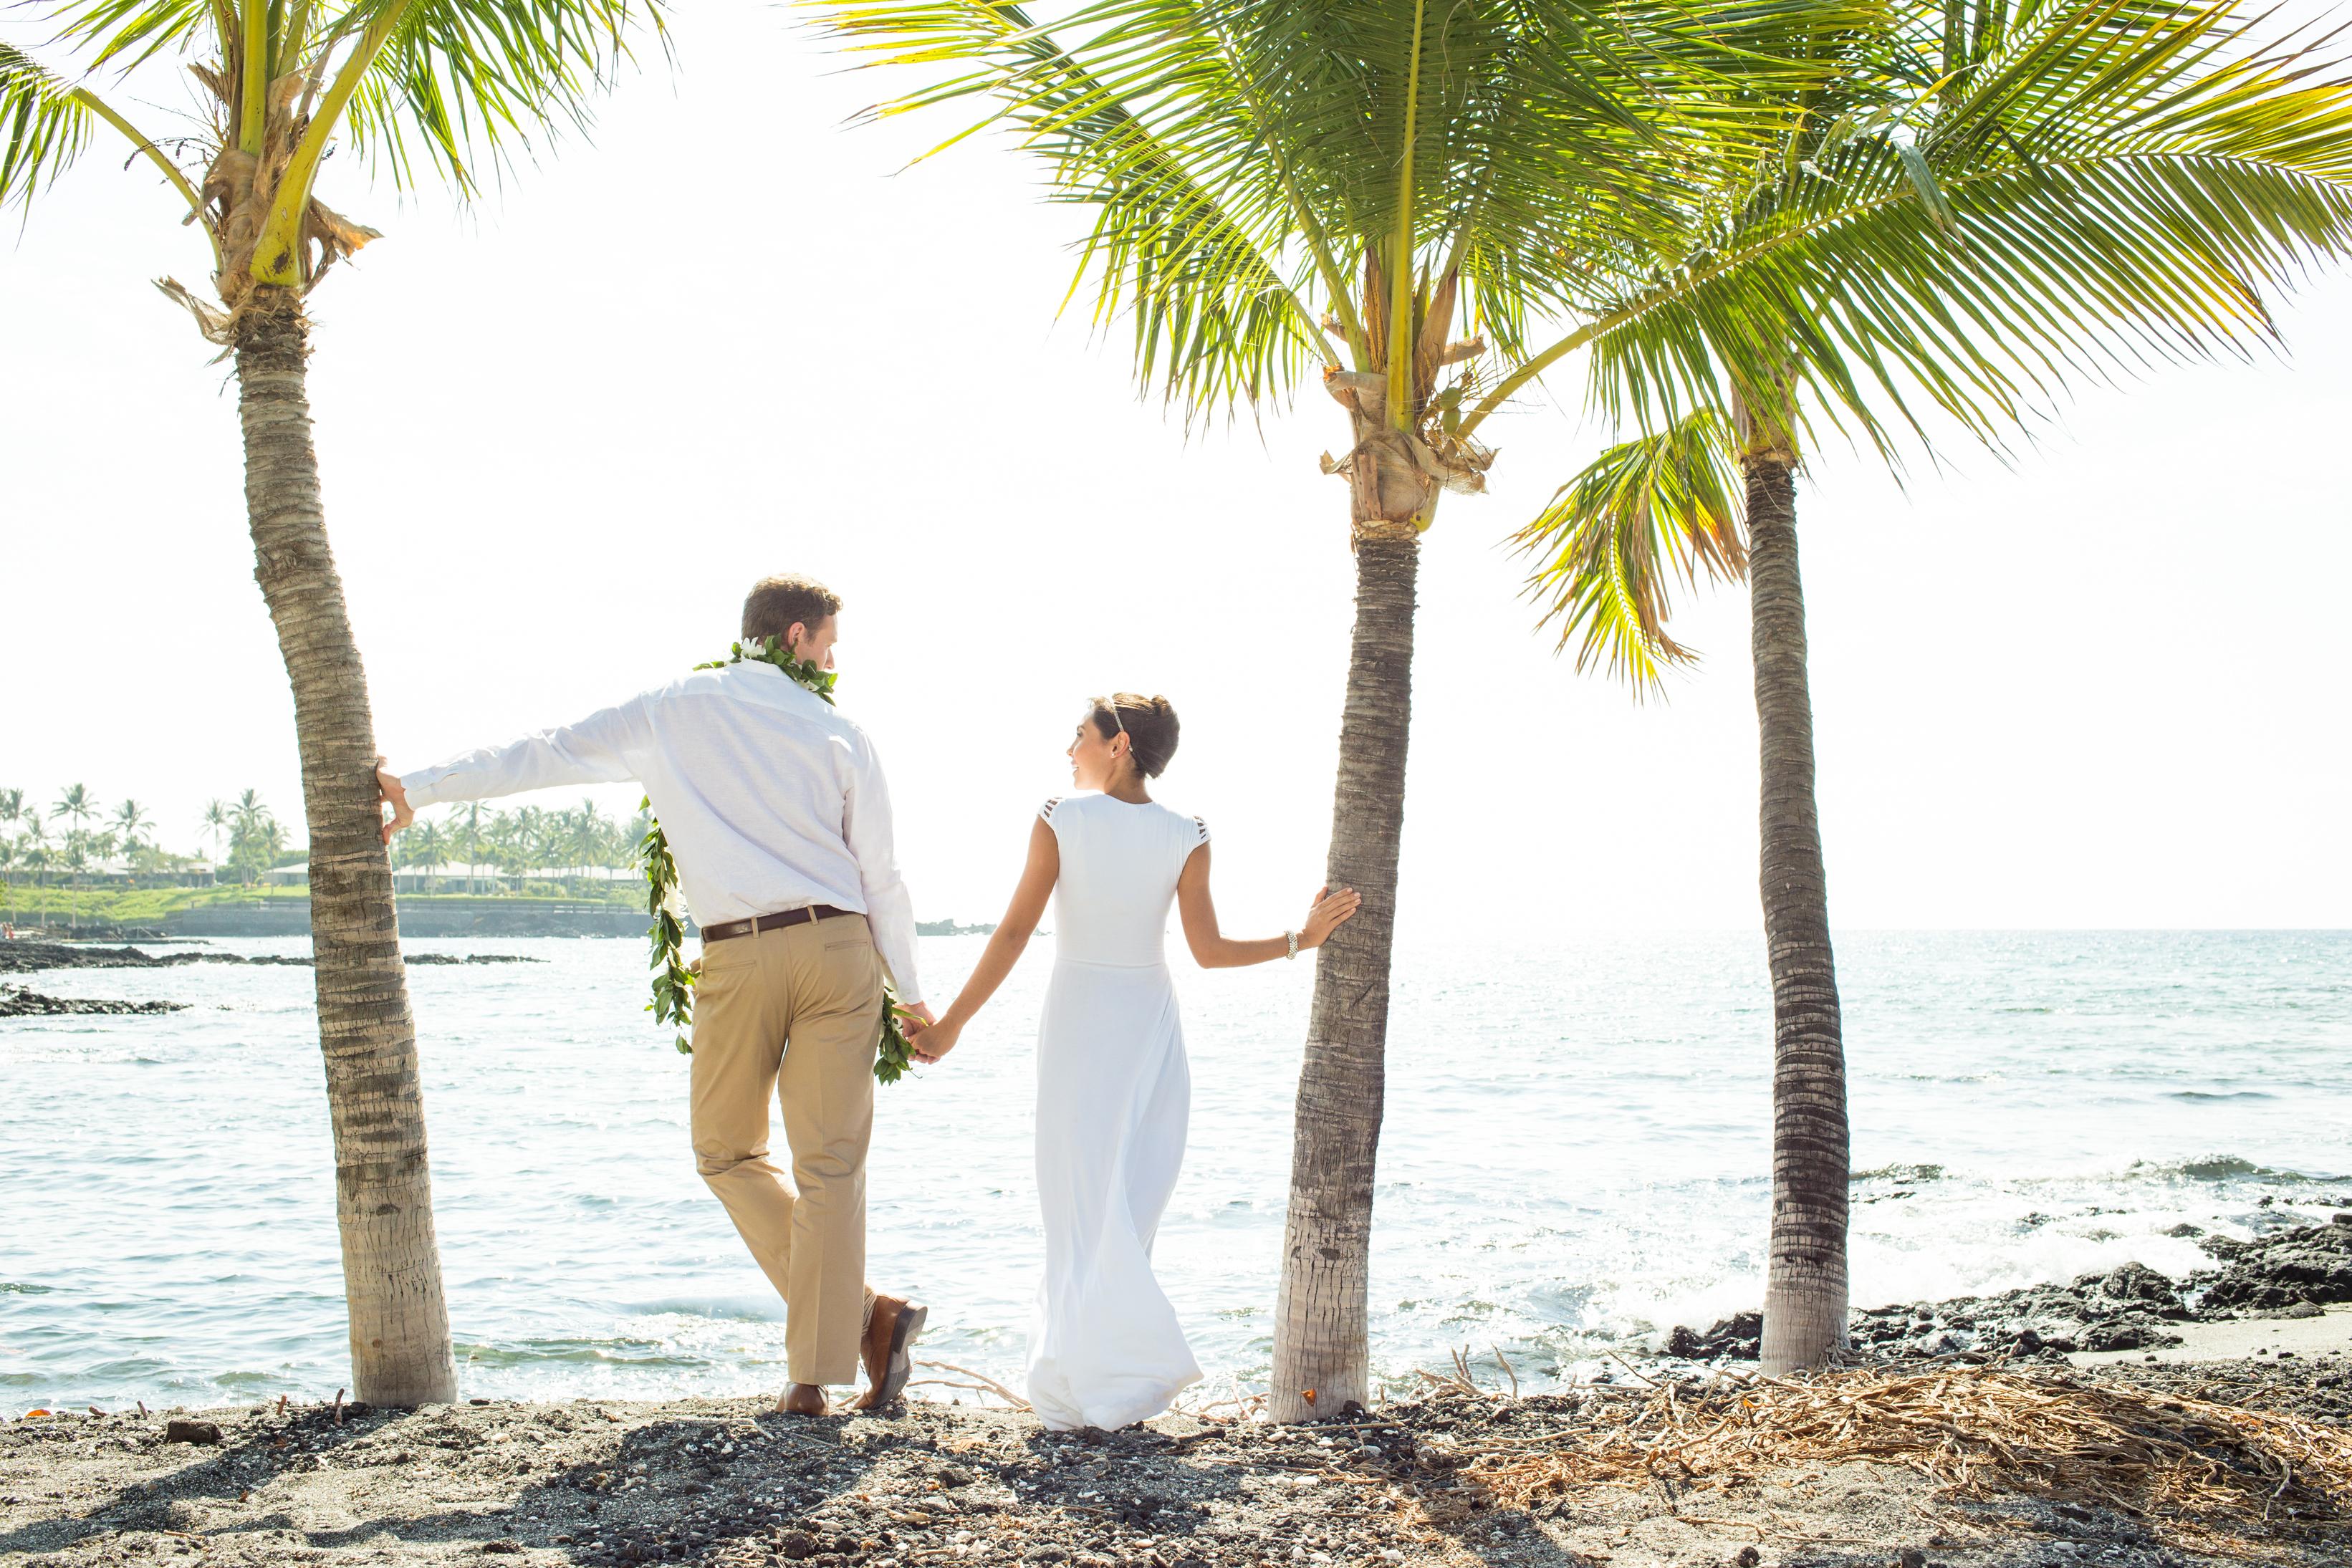 A Hawaii Honeymoon is a Newlyweds' Tropical Paradise